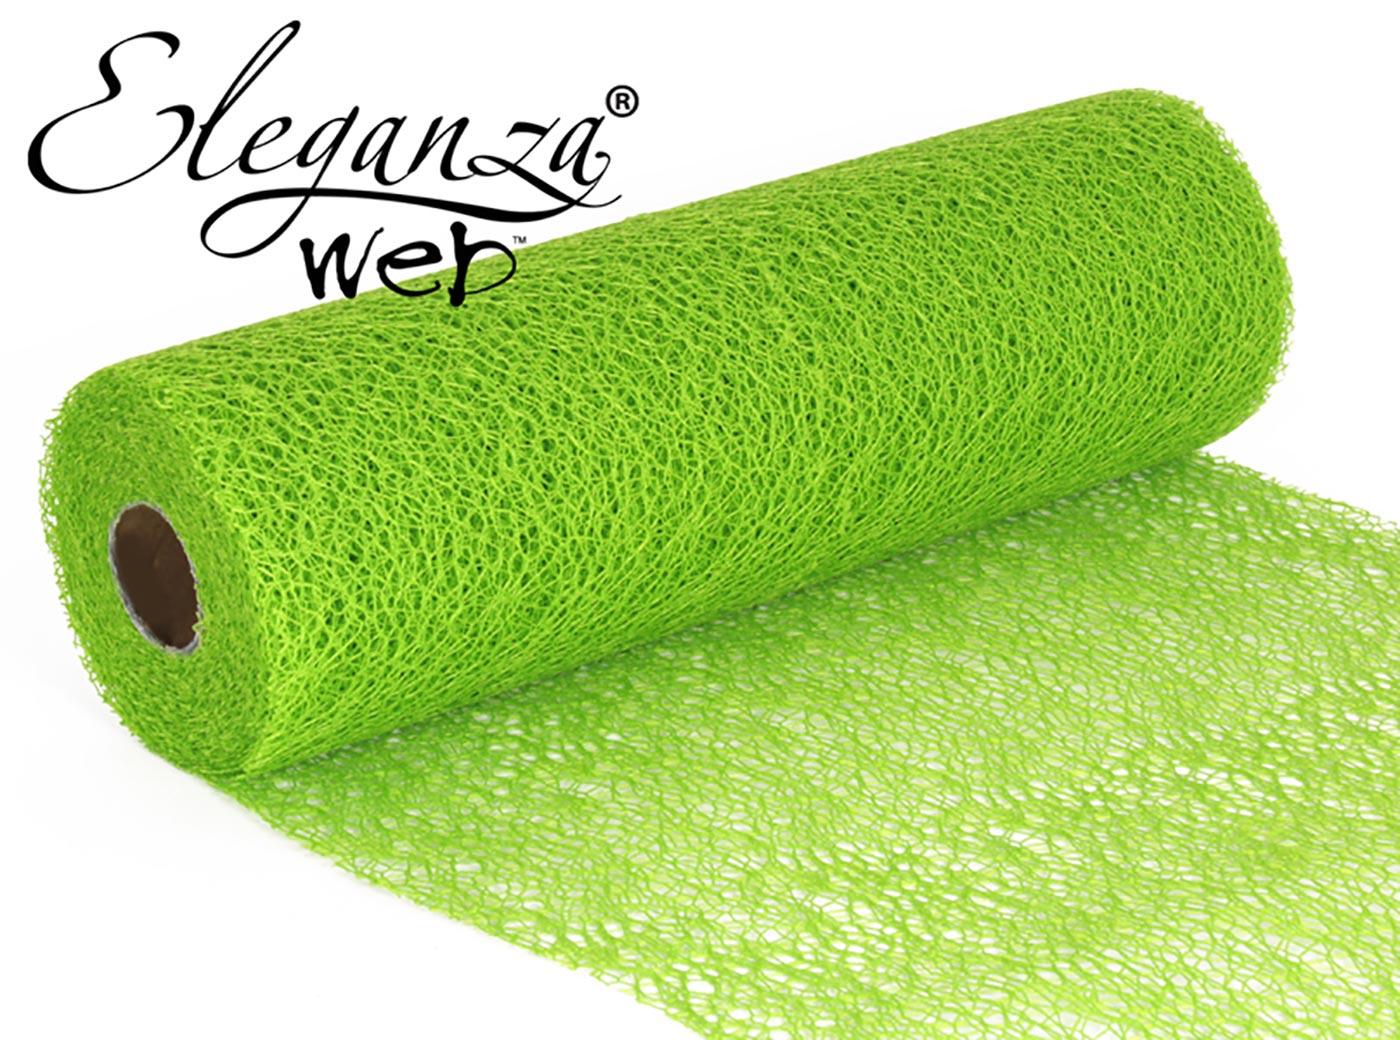 Eleganza Web Fabric roll 28cm x 10m Lime Green